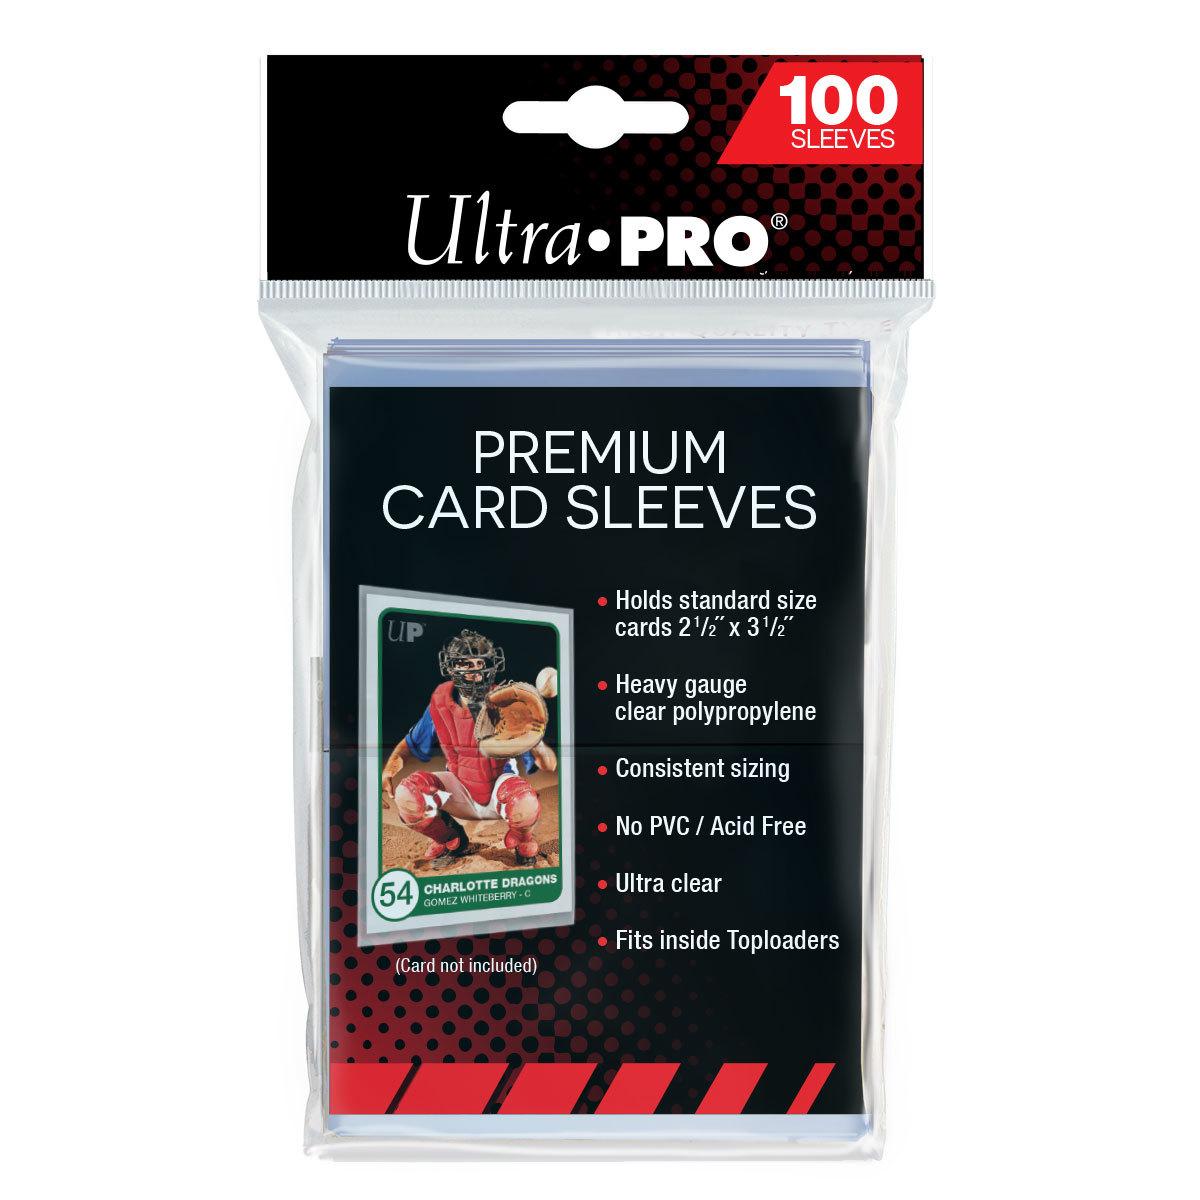 "Ultra Pro: Premium Card Sleeves (2-1/2"" x 3-1/2"") image"